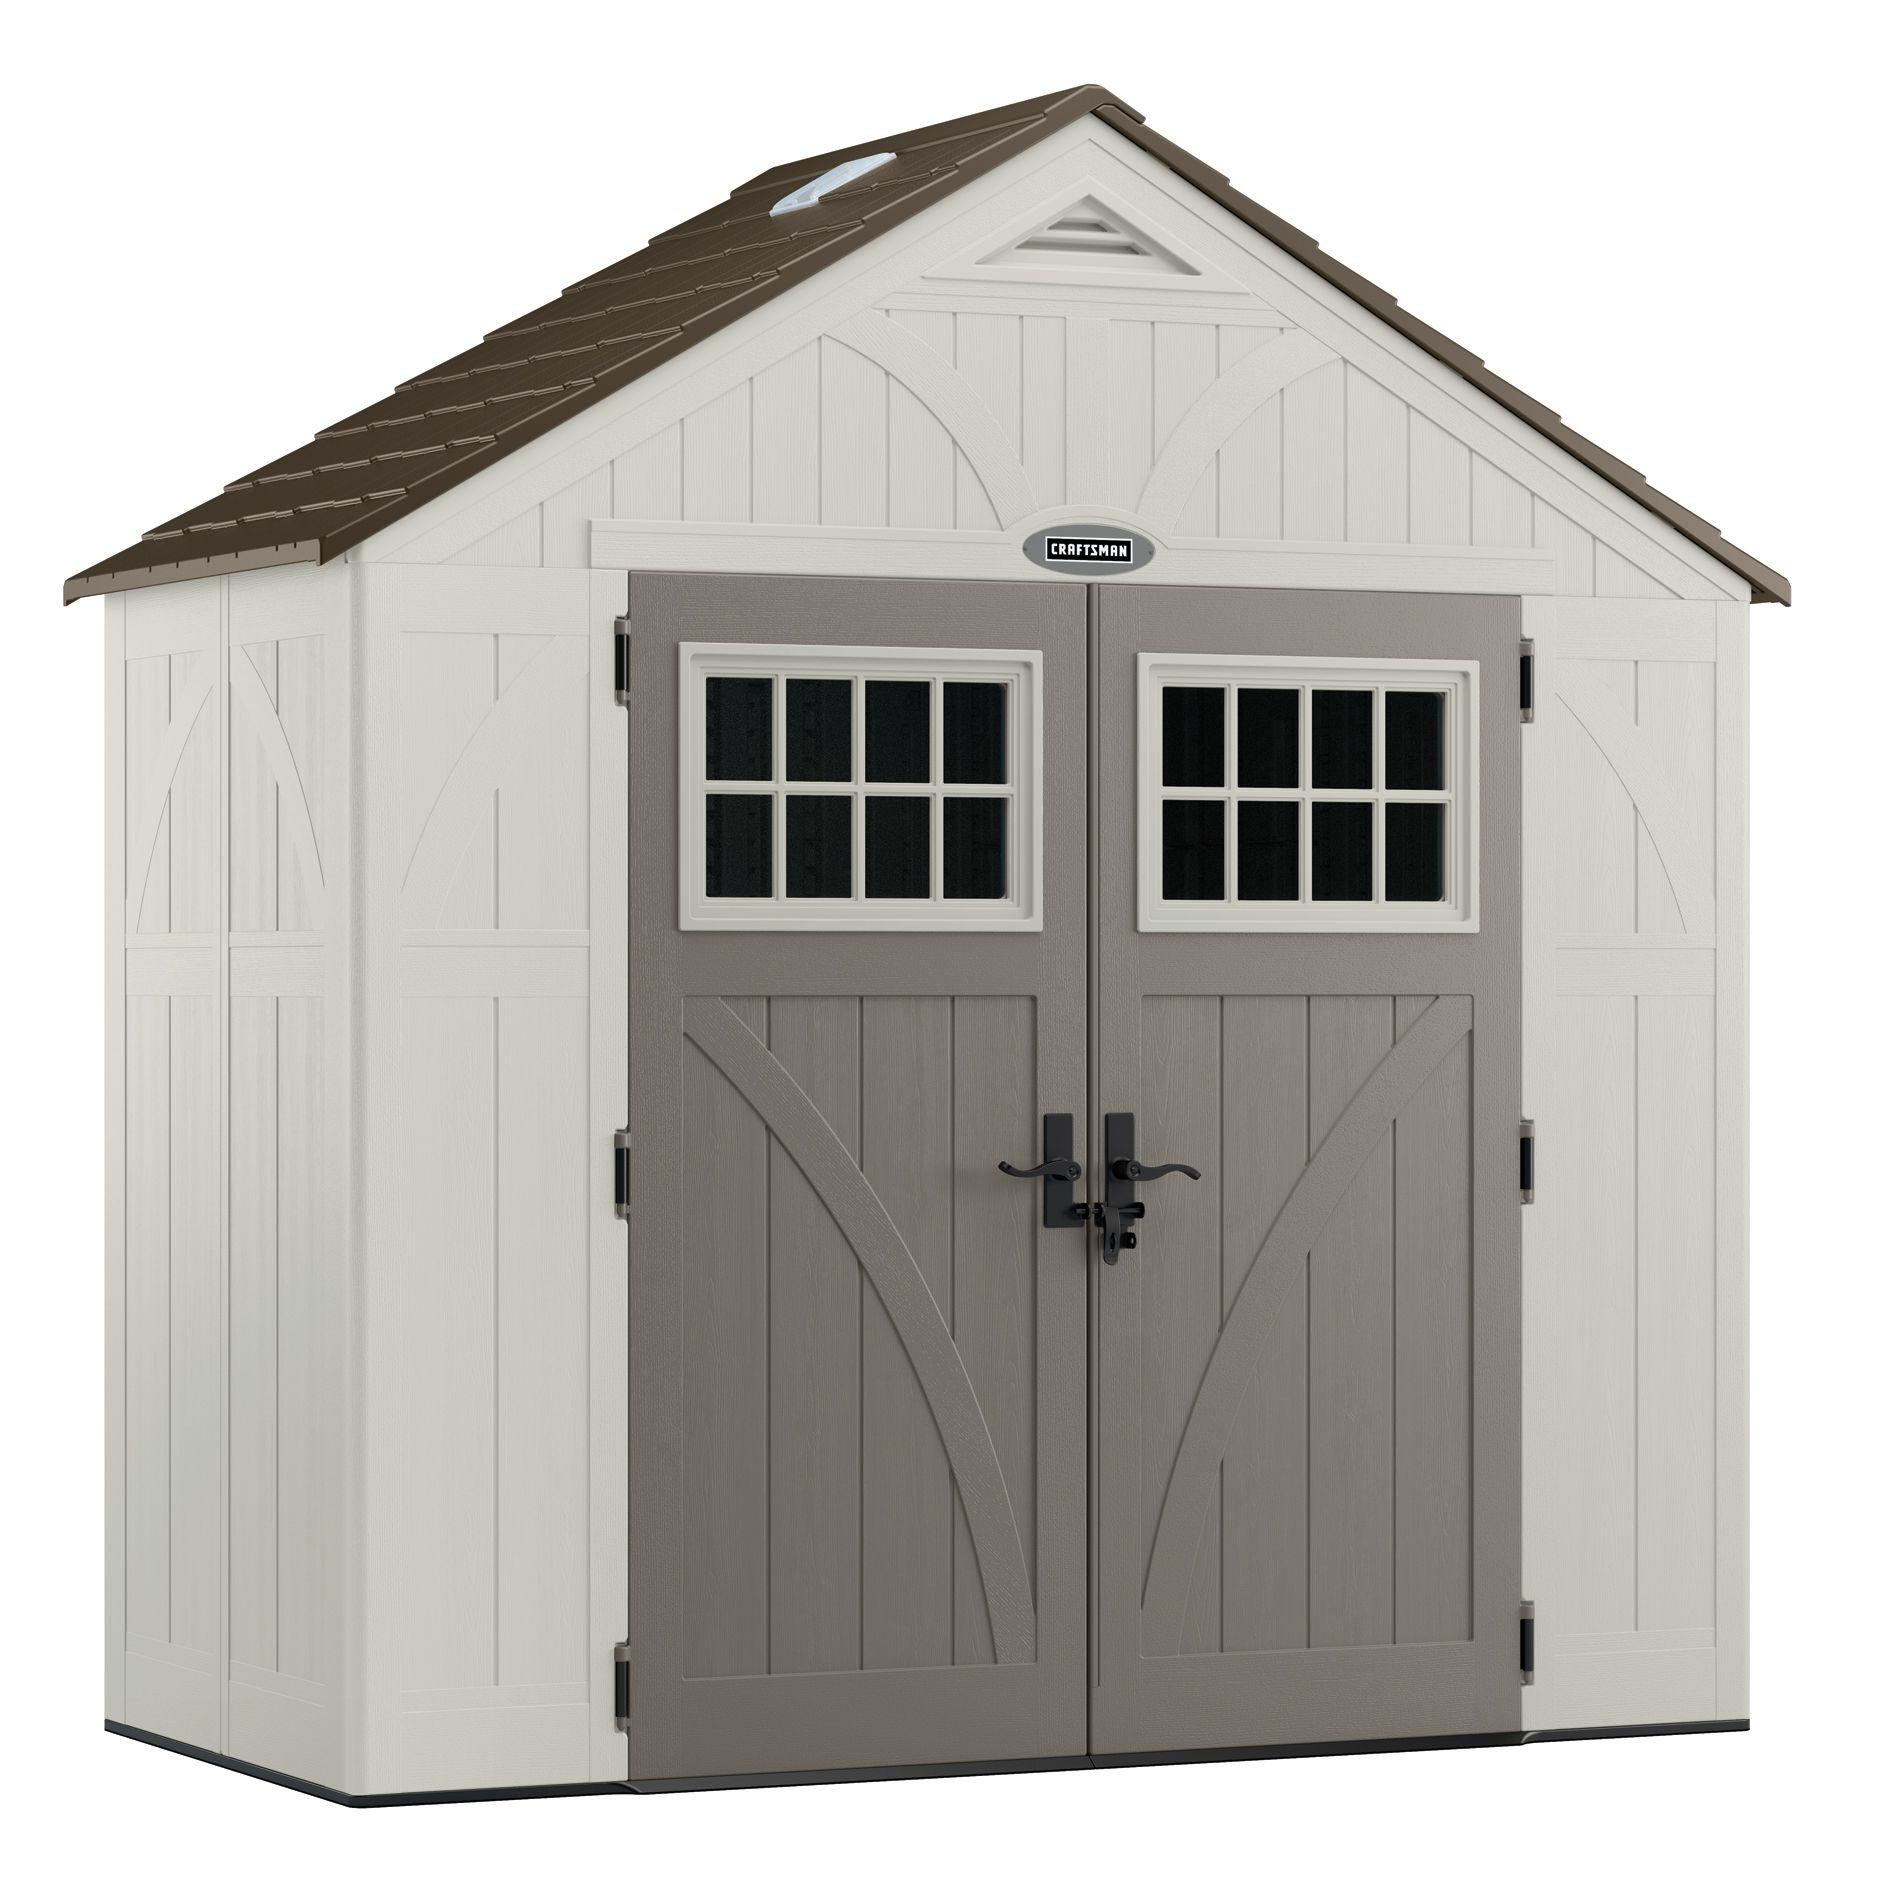 rubbermaid sheds craftsman cbms8401 8u0027 x 4u0027 storage shed VPDHZYB